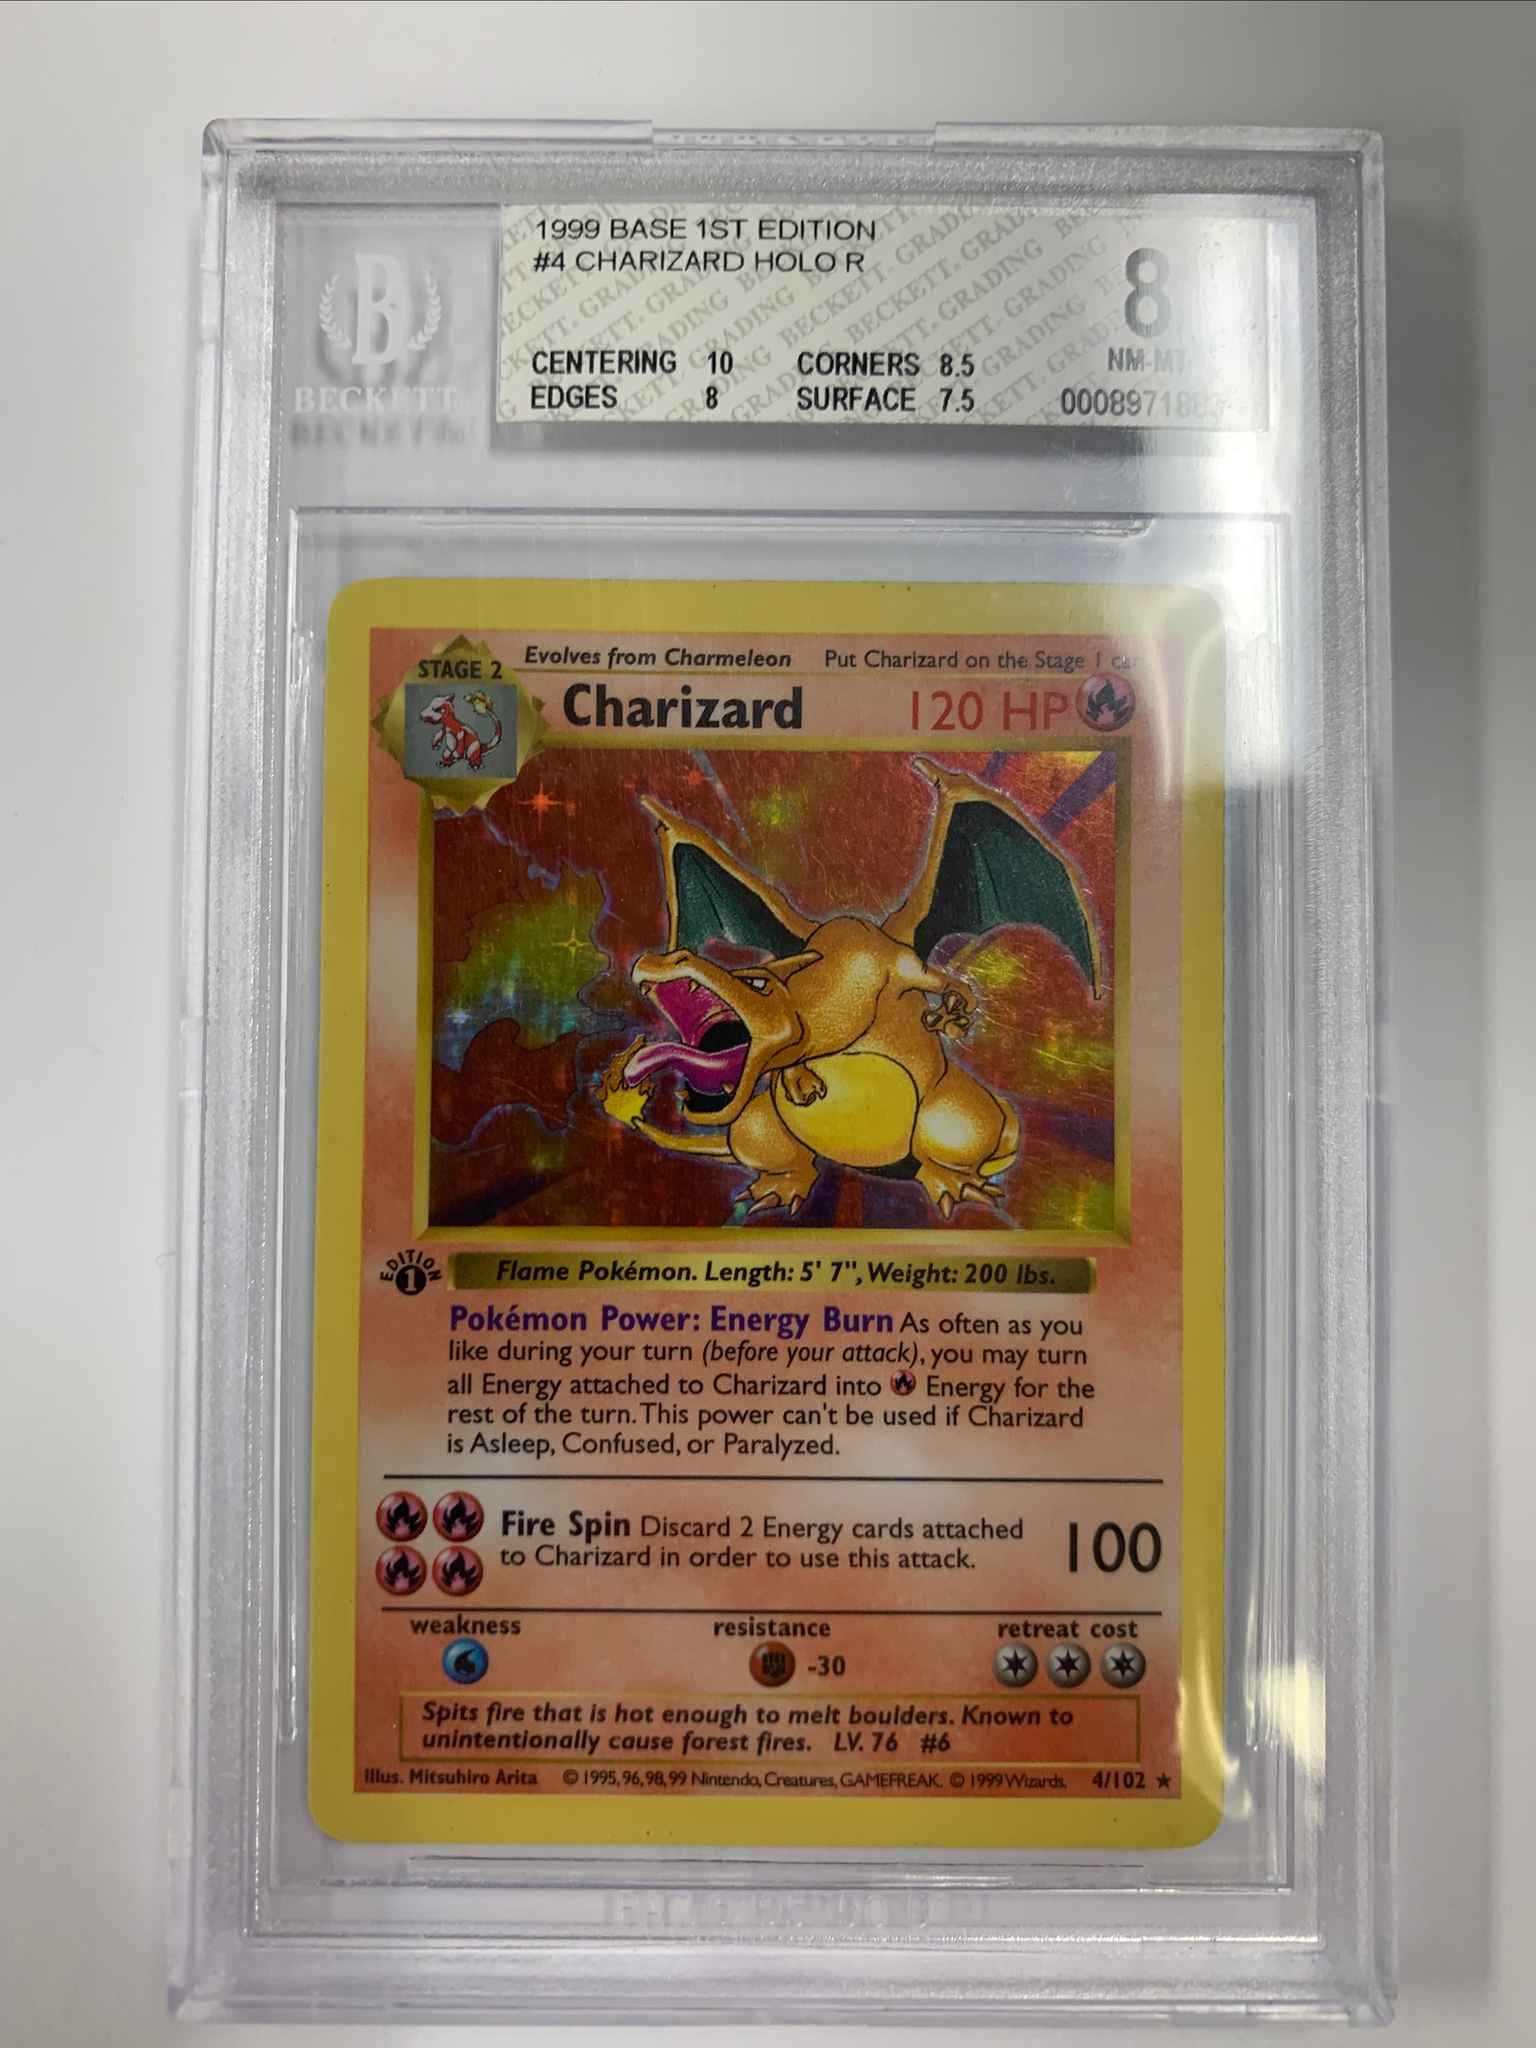 MINT 1999 Pokemon CHARIZARD Base Set WOTC 10 card RePack READ DESCRIPTION